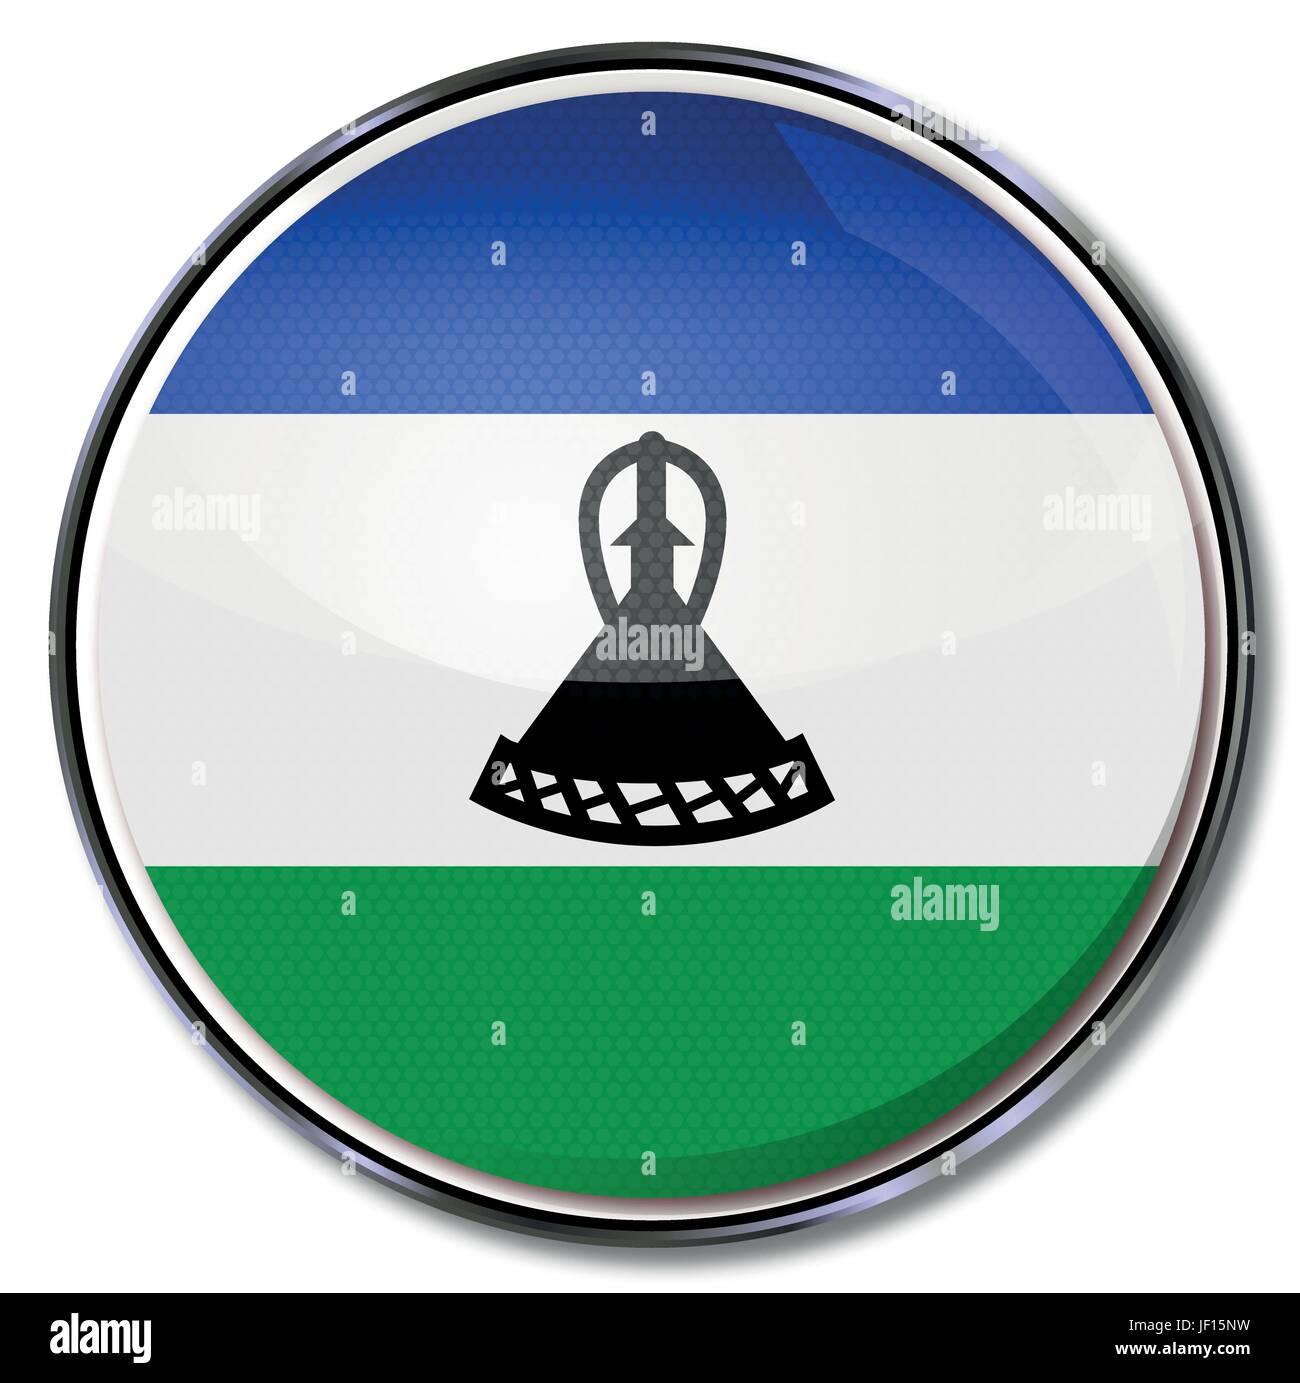 africa, monarchy, kingdom, lesotho, social, africa, flag, border, button, card, - Stock Vector